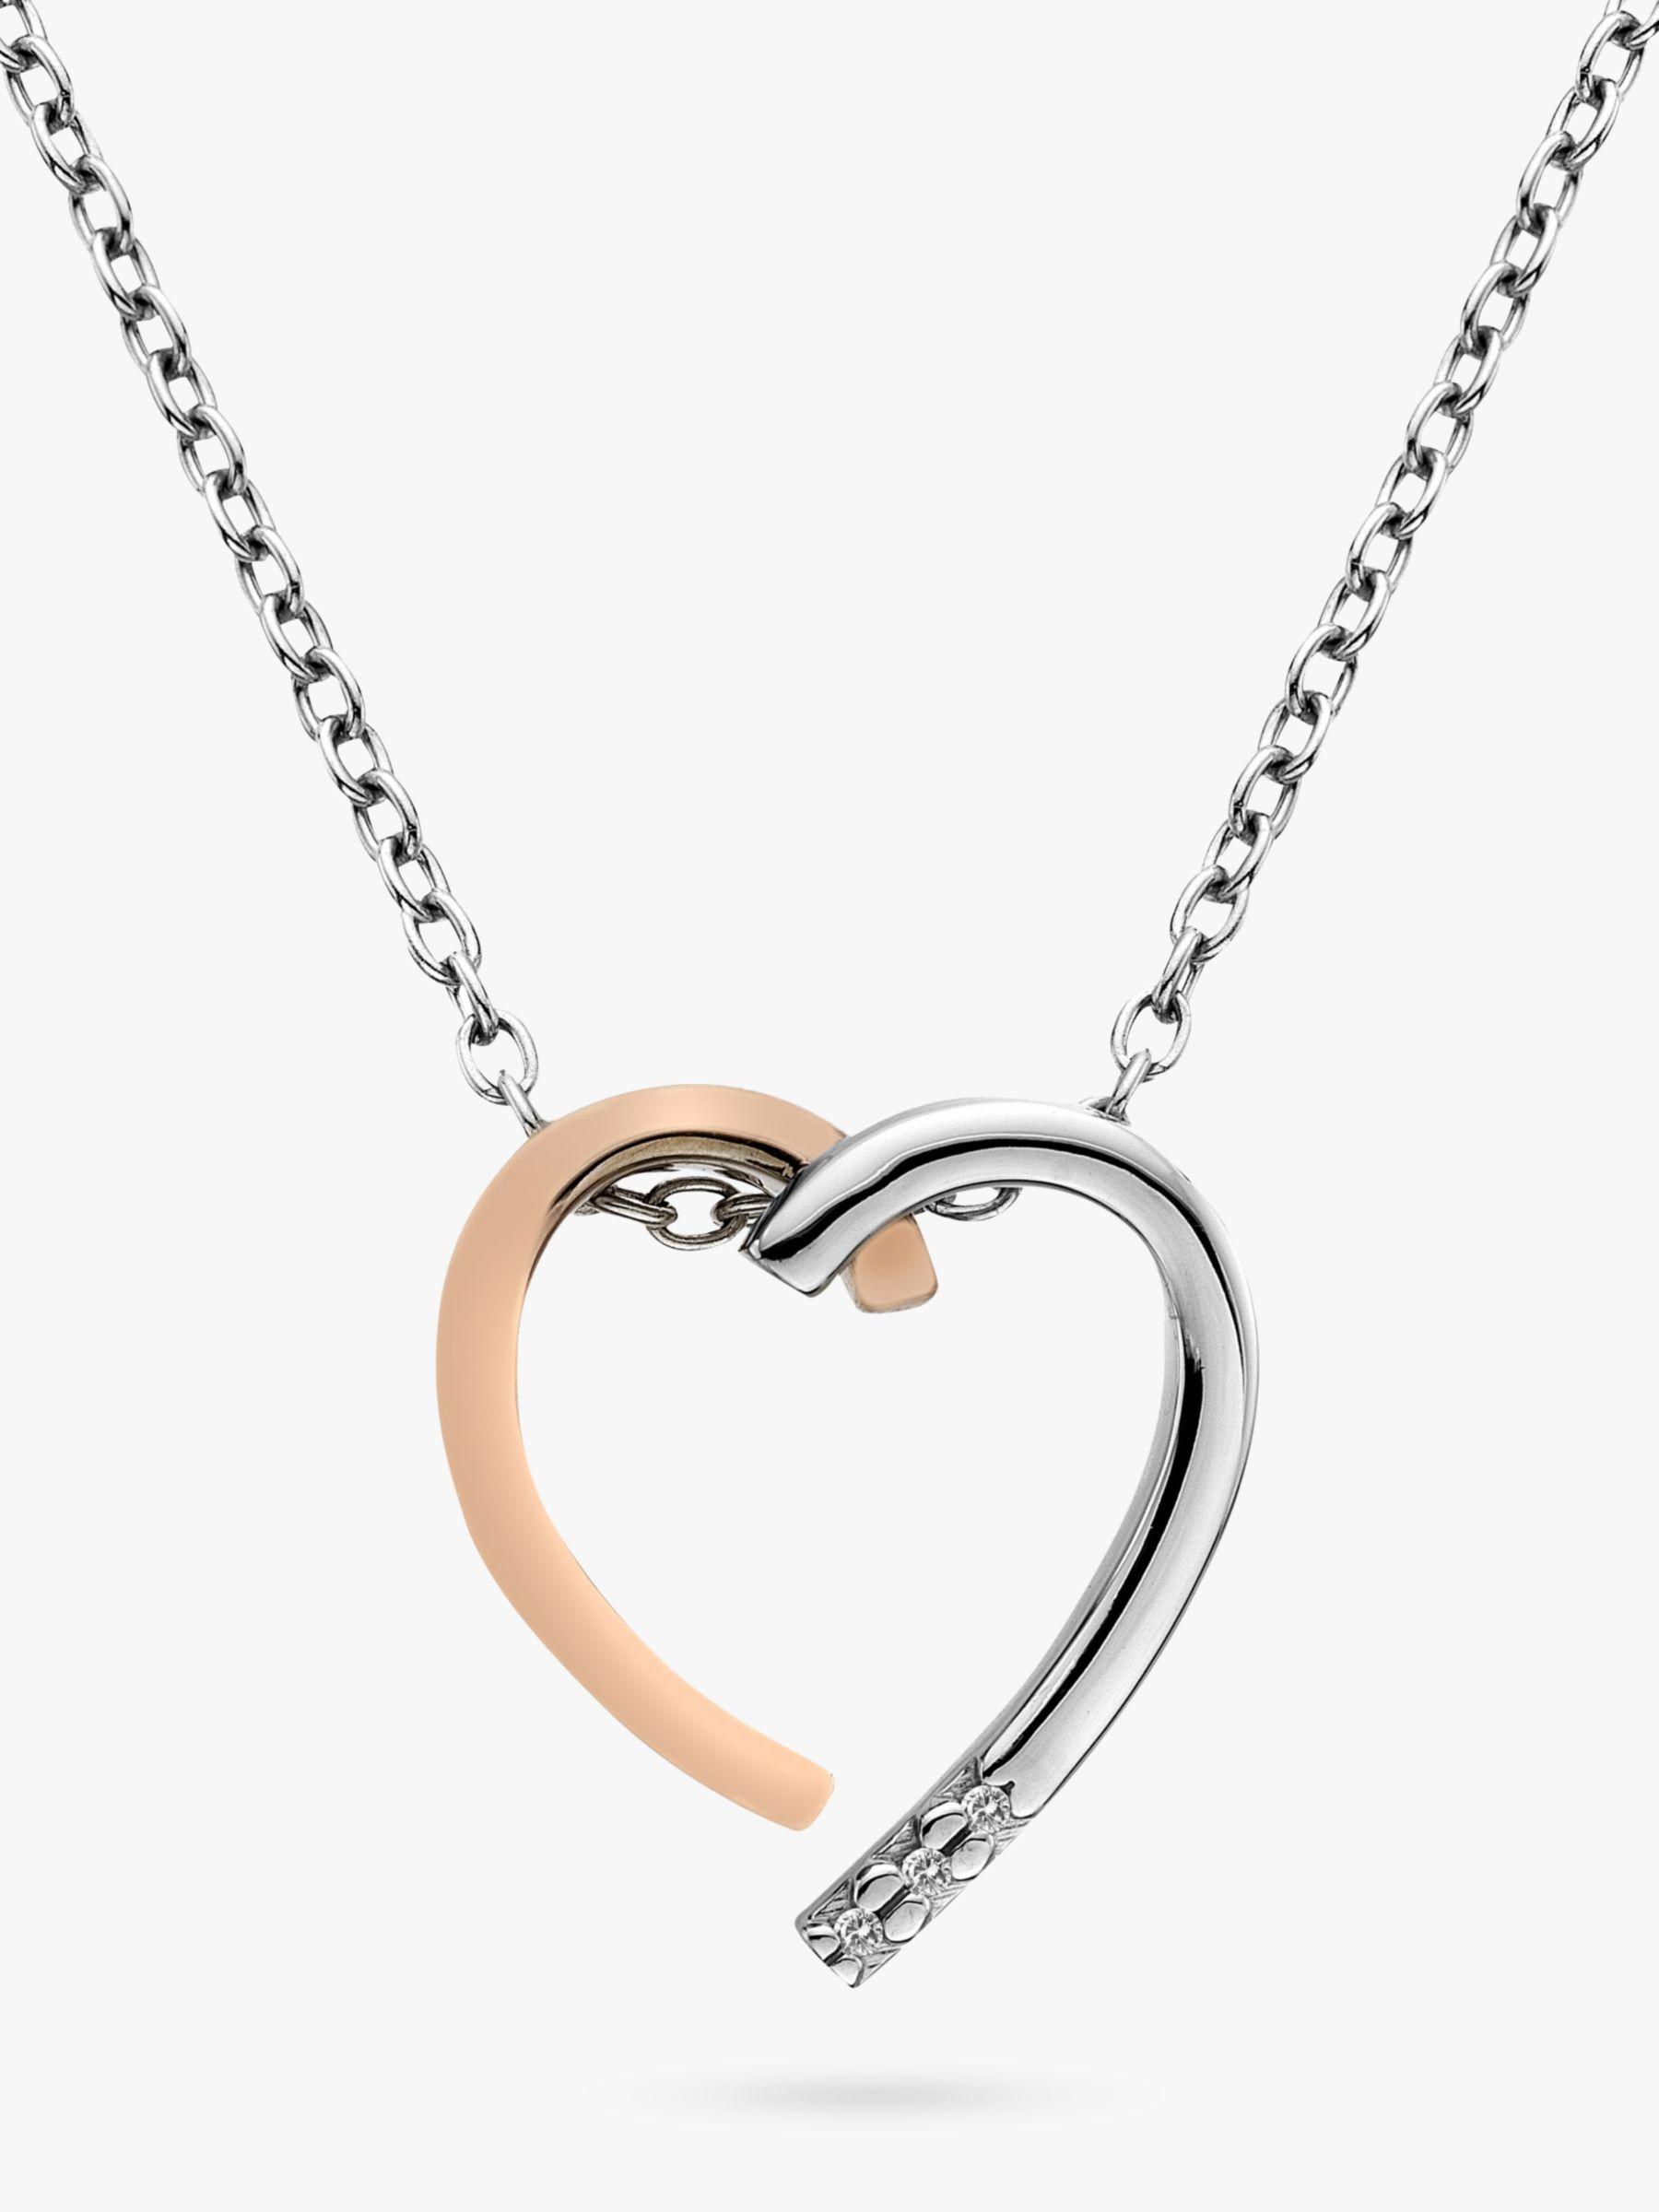 Hot Diamonds Hot Diamonds Large Heart Pendant Necklace, Silver/Rose Gold